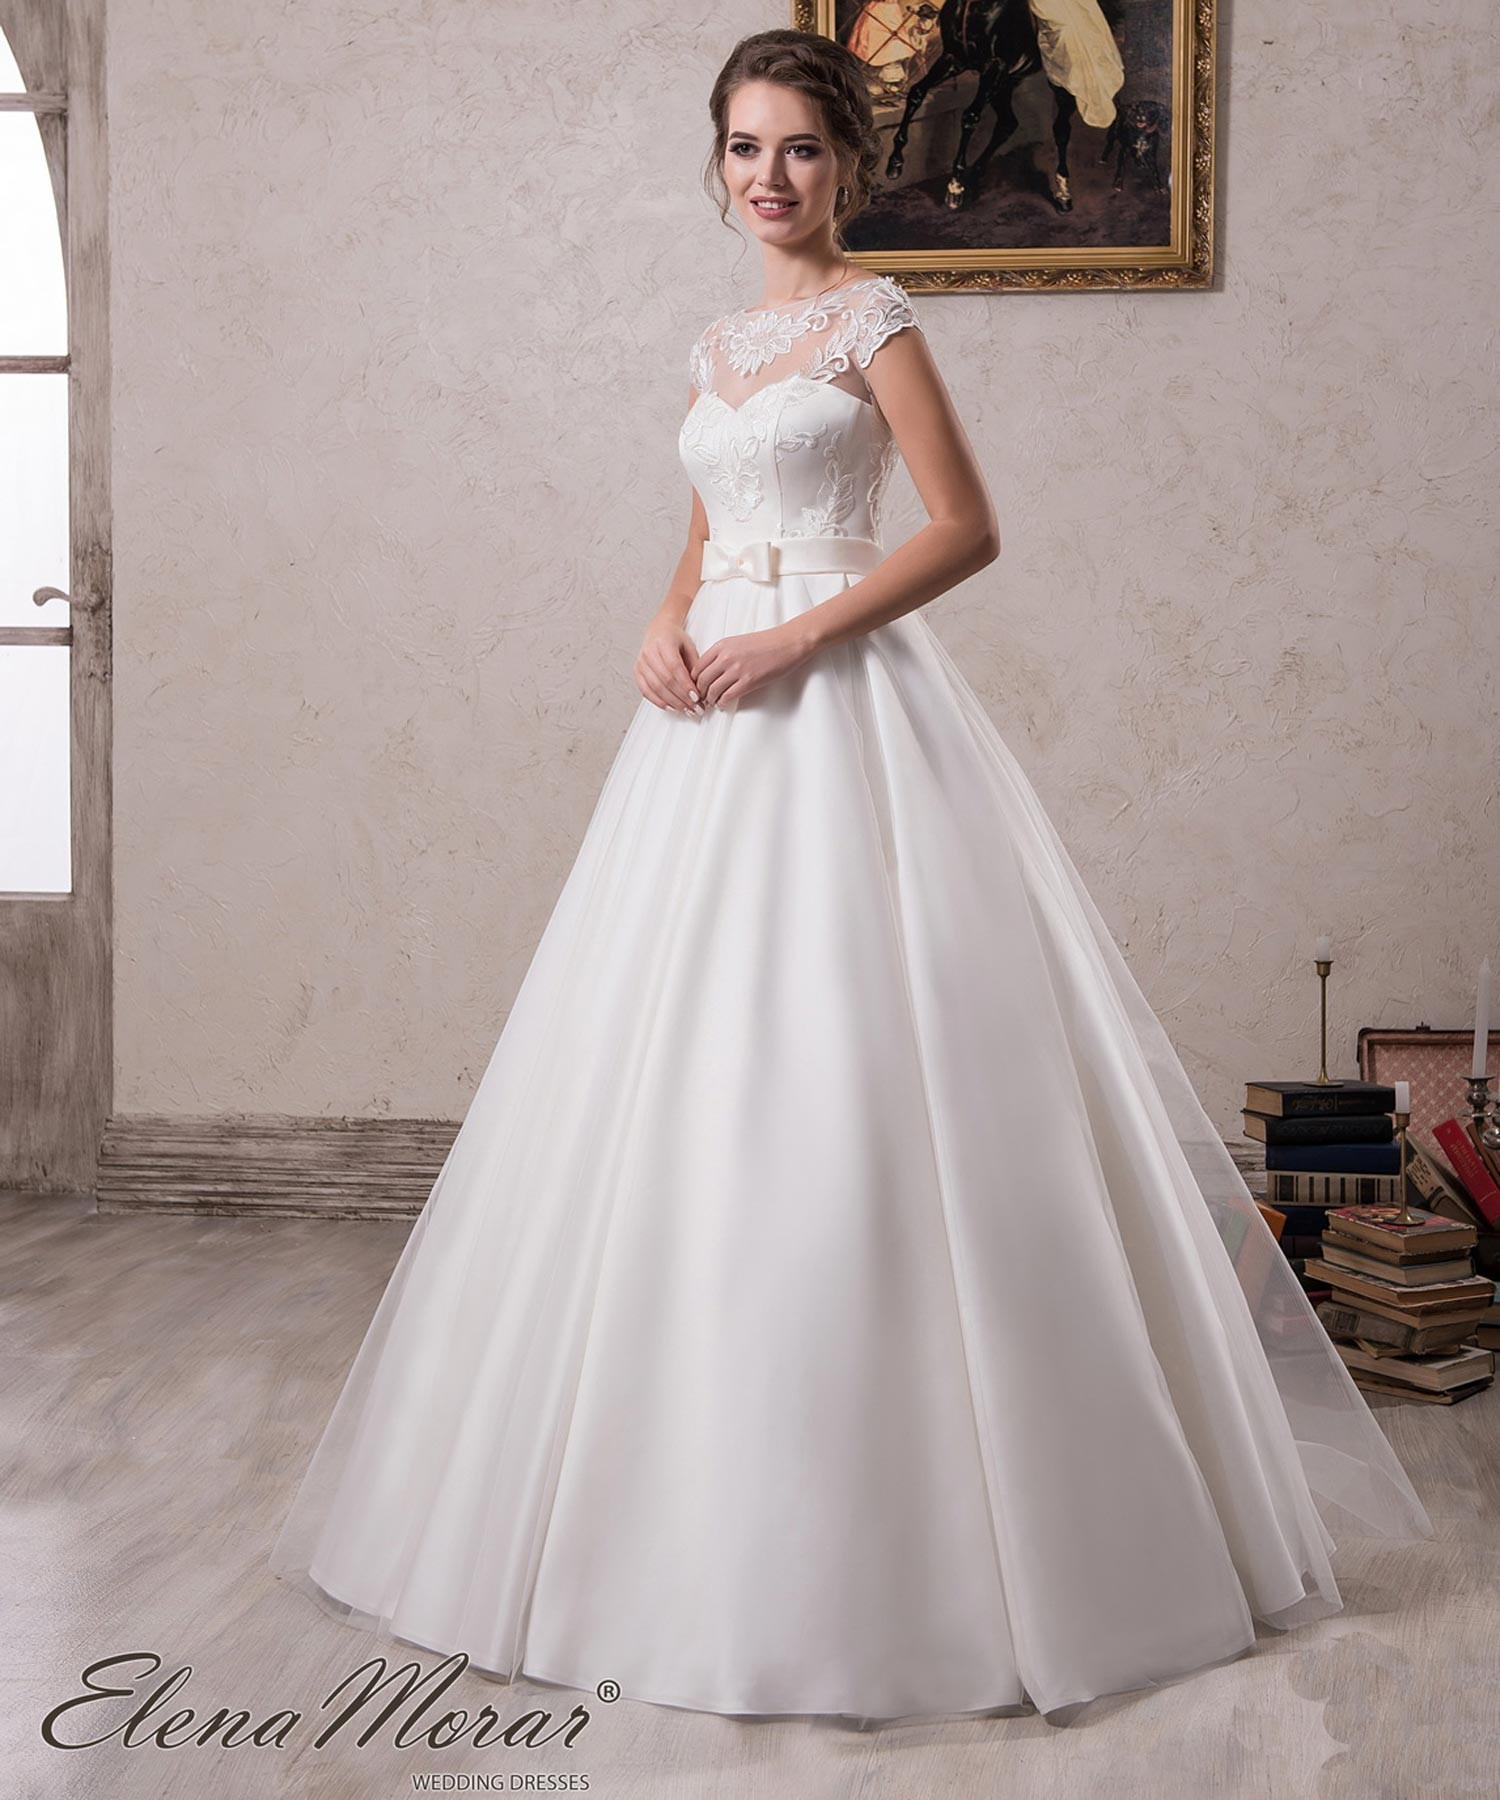 pas mal 48104 d11a9 Robe de mariage princesse satin et dentelle Selena